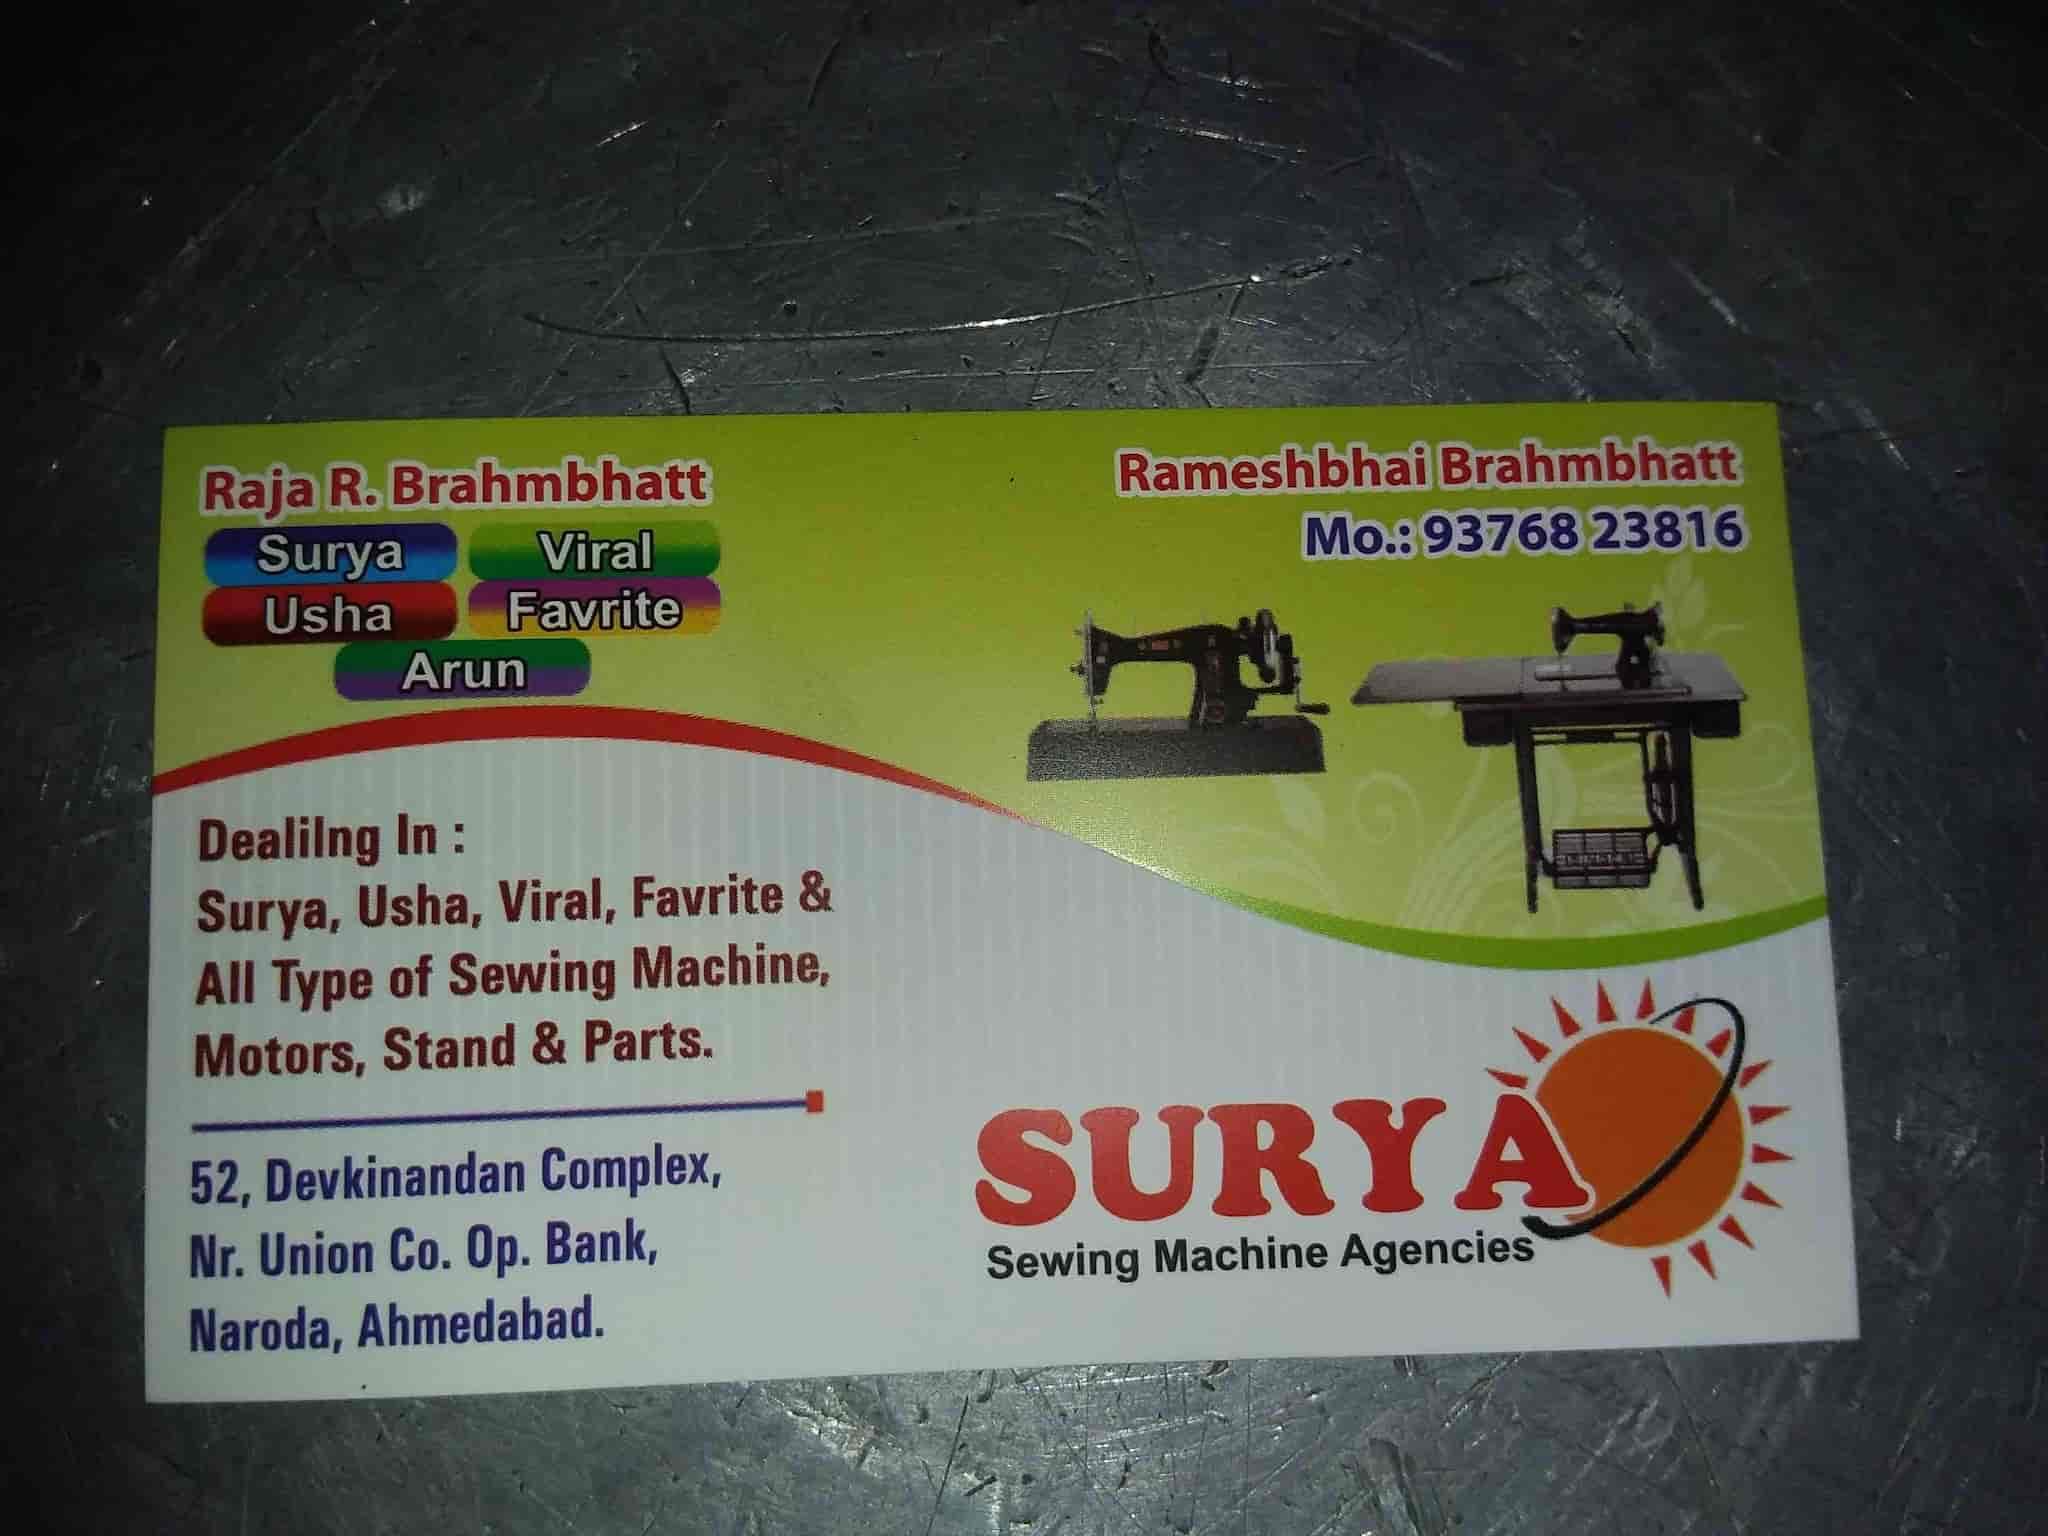 Surya Silai Machine Agency Photos, Naroda, Ahmedabad